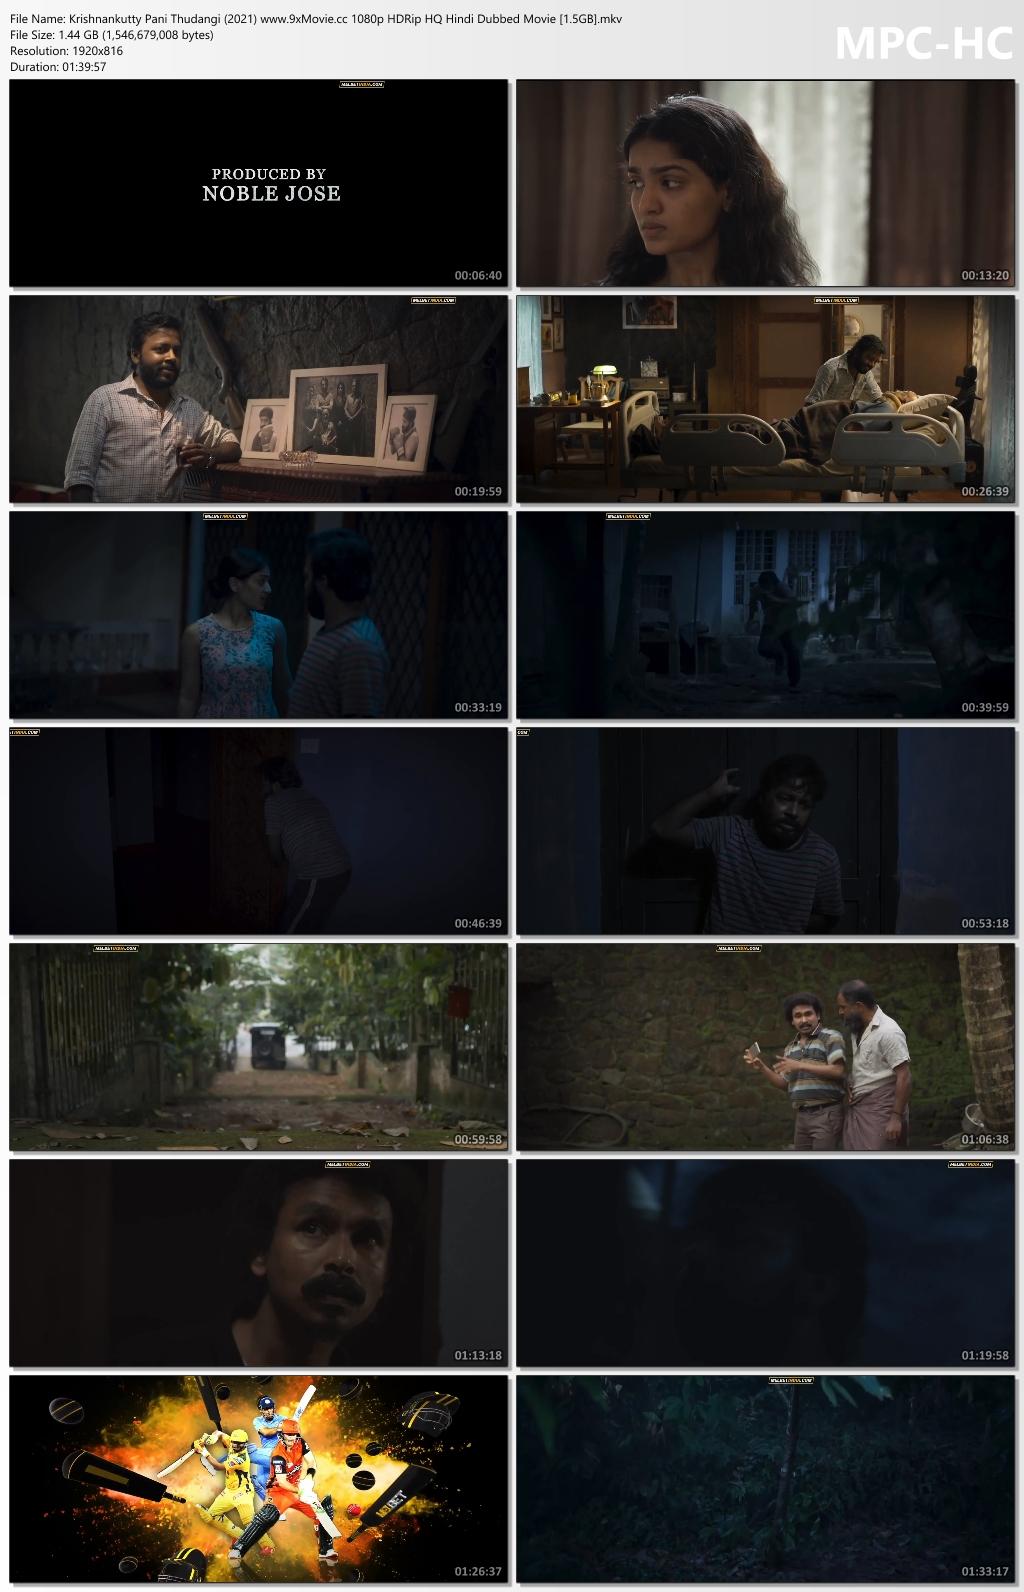 Krishnankutty-Pani-Thudangi-2021-www-9x-Movie-cc-1080p-HDRip-HQ-Hindi-Dubbed-Movie-1-5-GB-mkv